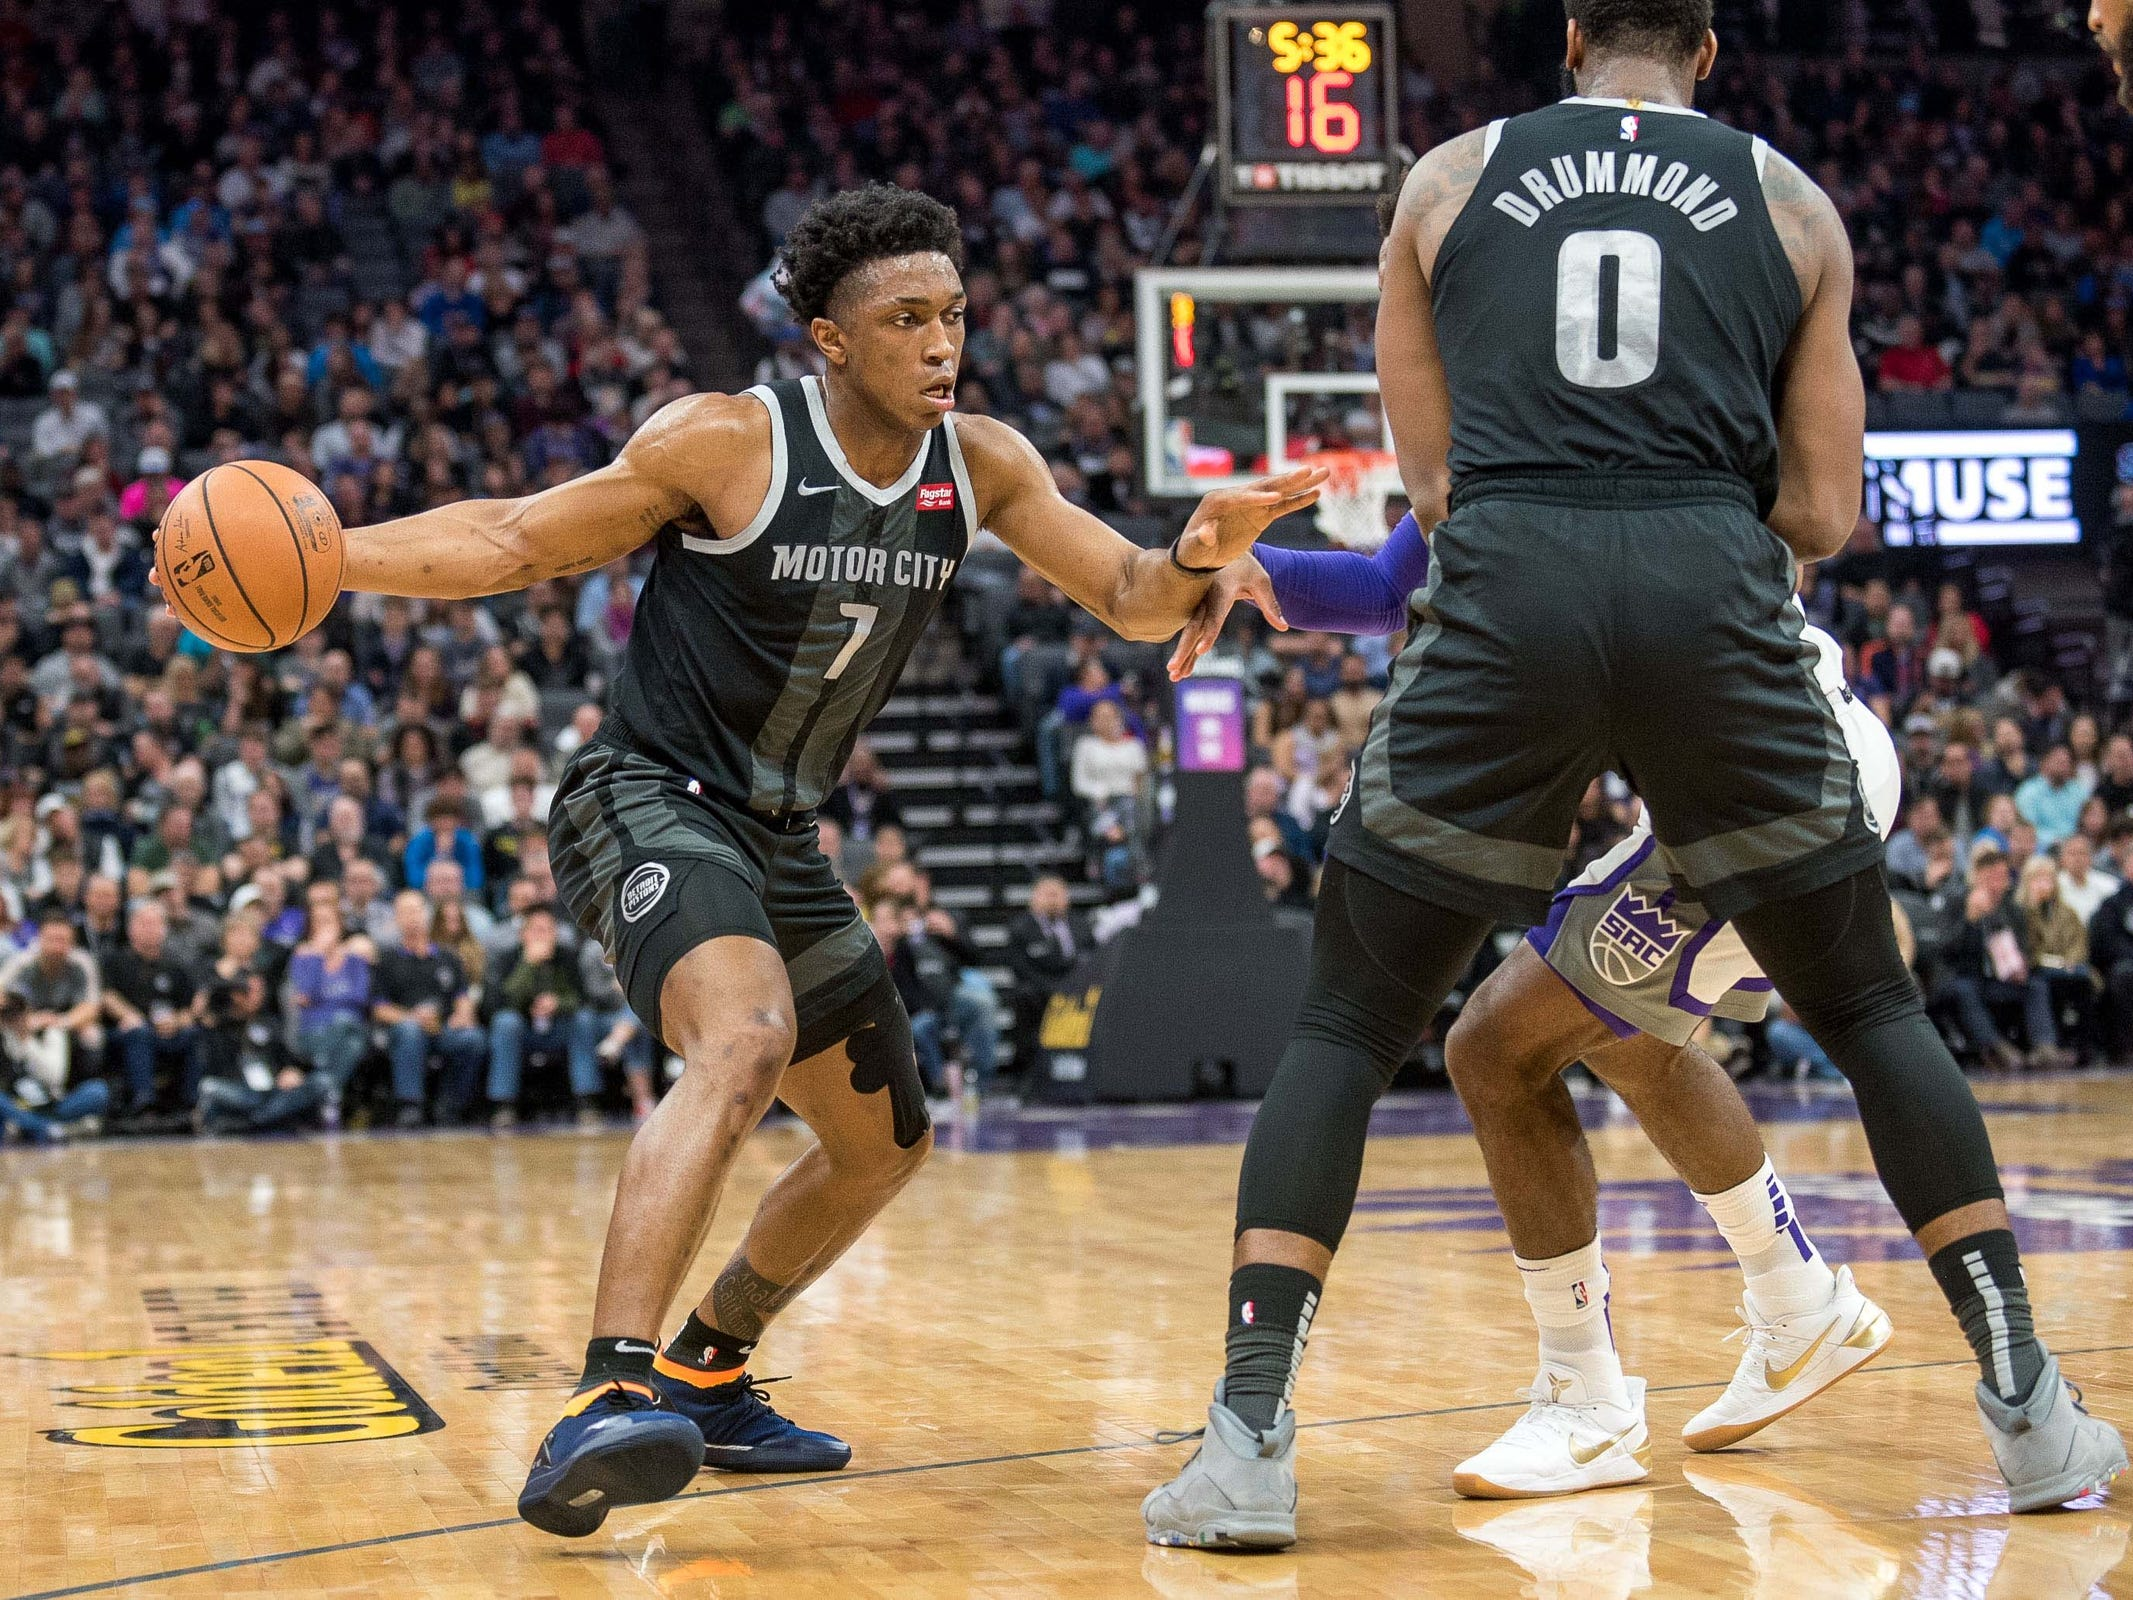 Detroit Pistons forward Stanley Johnson (7) drives to the basket during the second quarter against the Sacramento Kings at Golden 1 Center on Thursday, Jan. 10, 2019, in Sacramento, Calif.